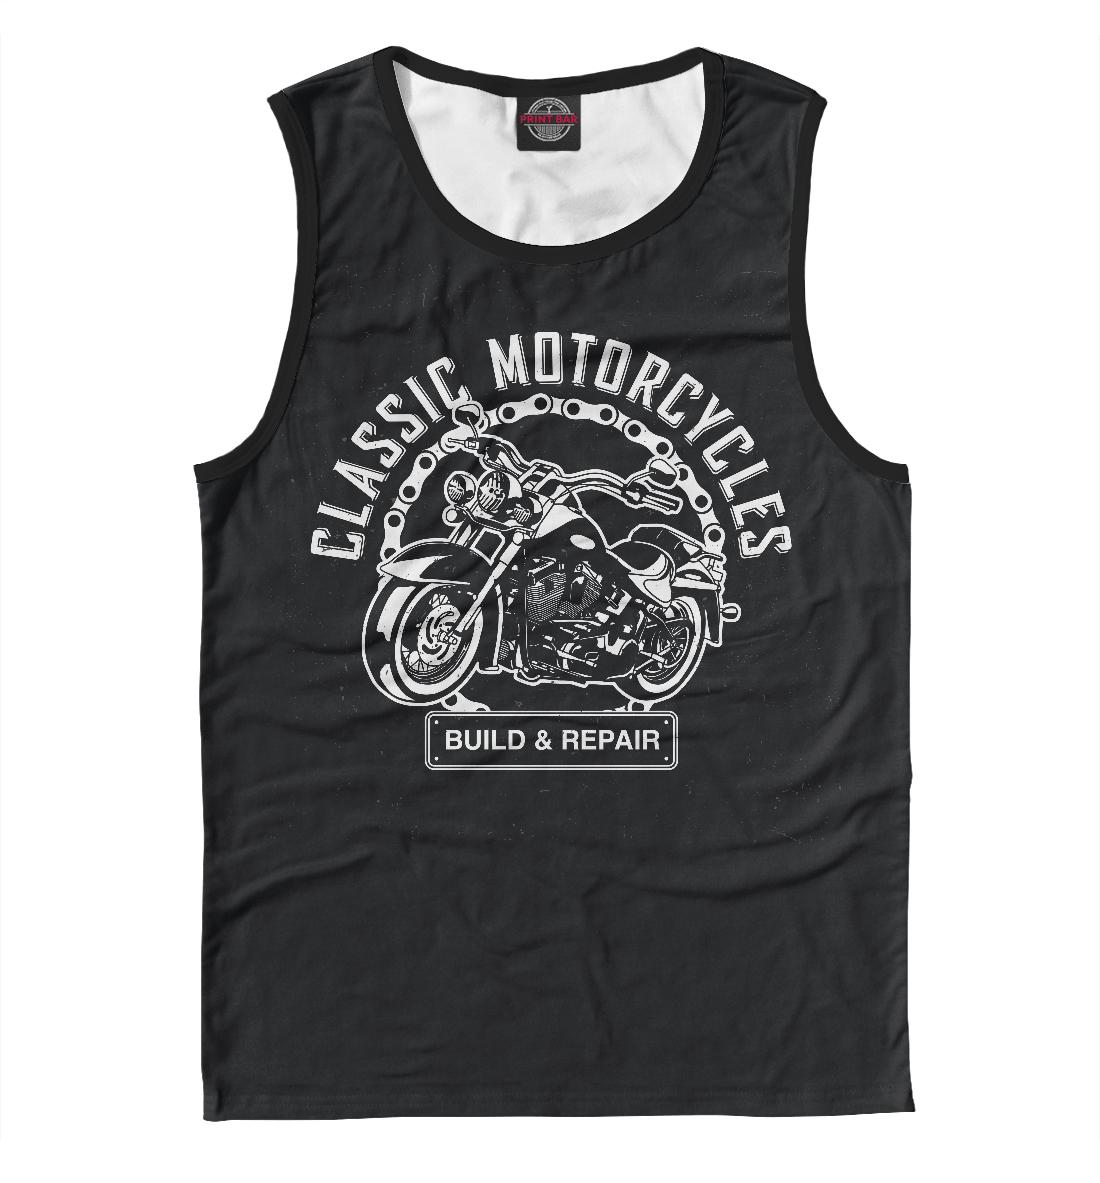 Купить Motorcycles, Printbar, Майки, MTR-990811-may-2